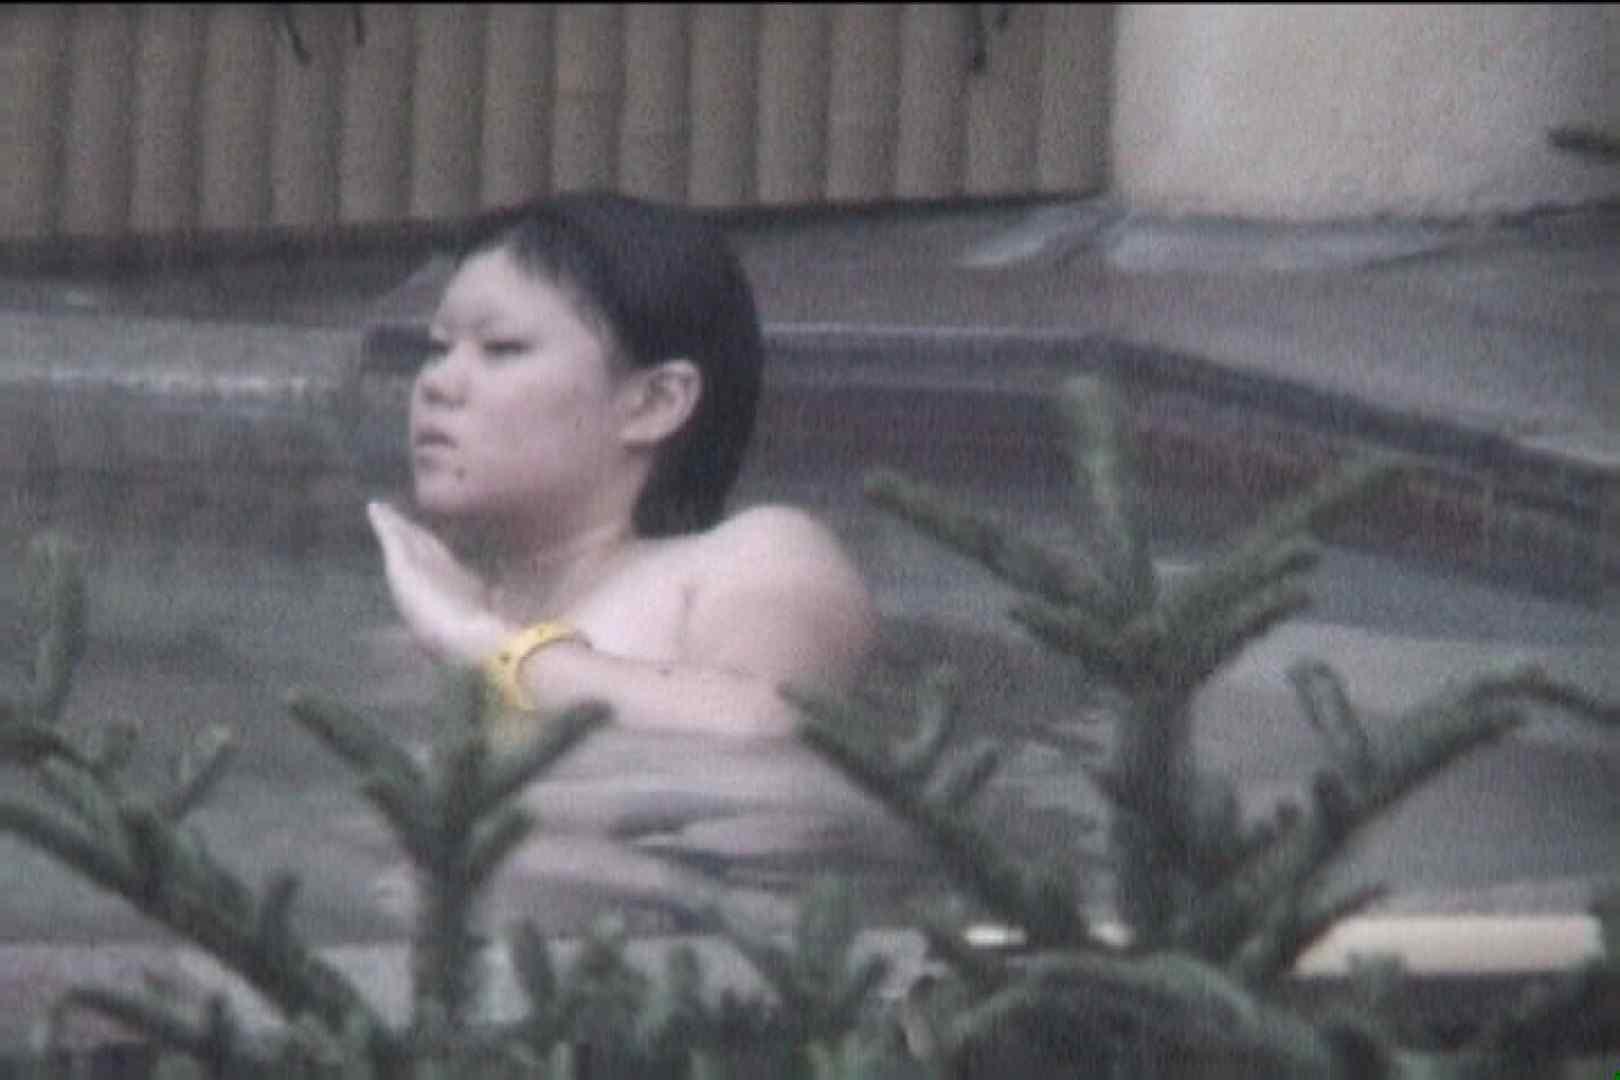 Aquaな露天風呂Vol.09 盗撮 | OLエロ画像  72PICs 40